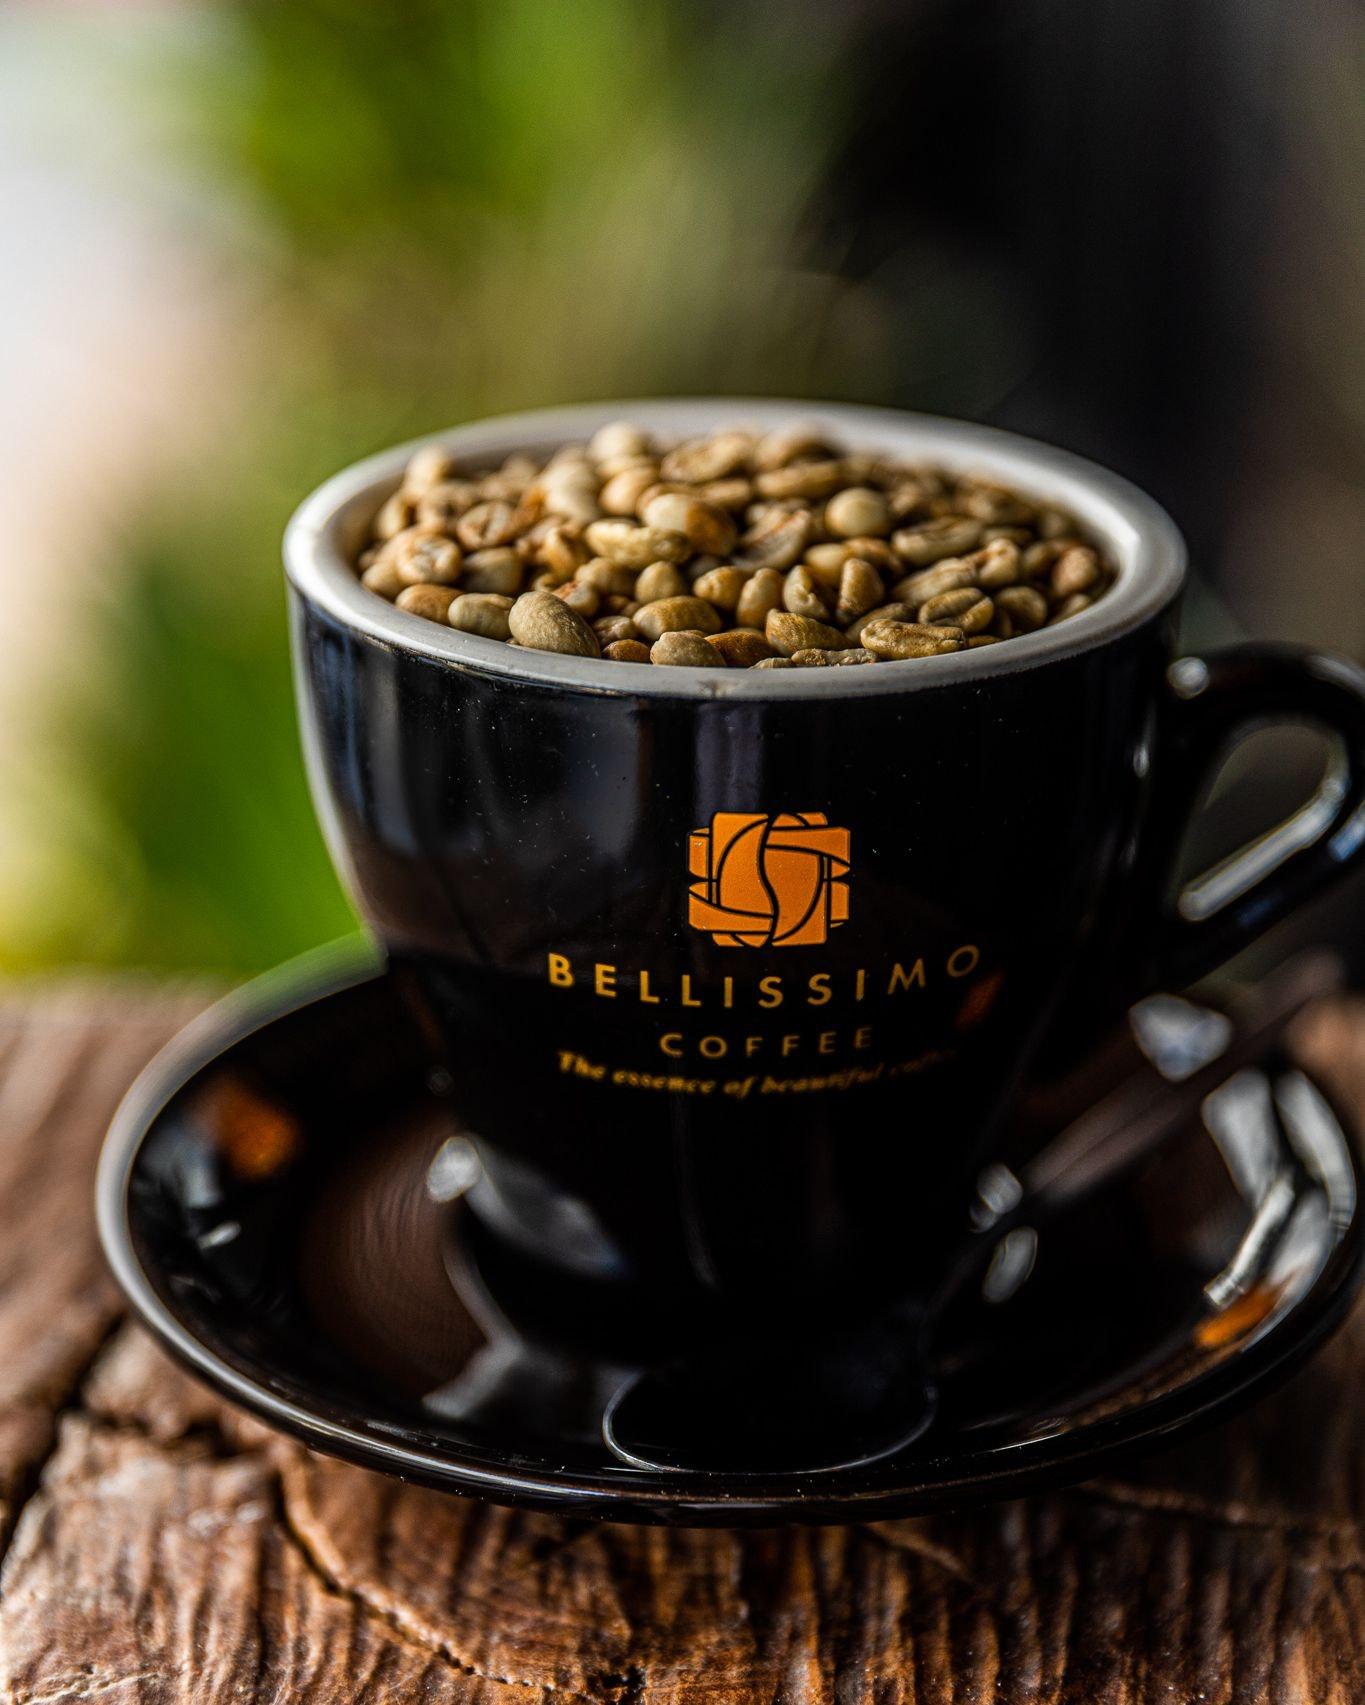 Bellissimo Coffee in Brisbane